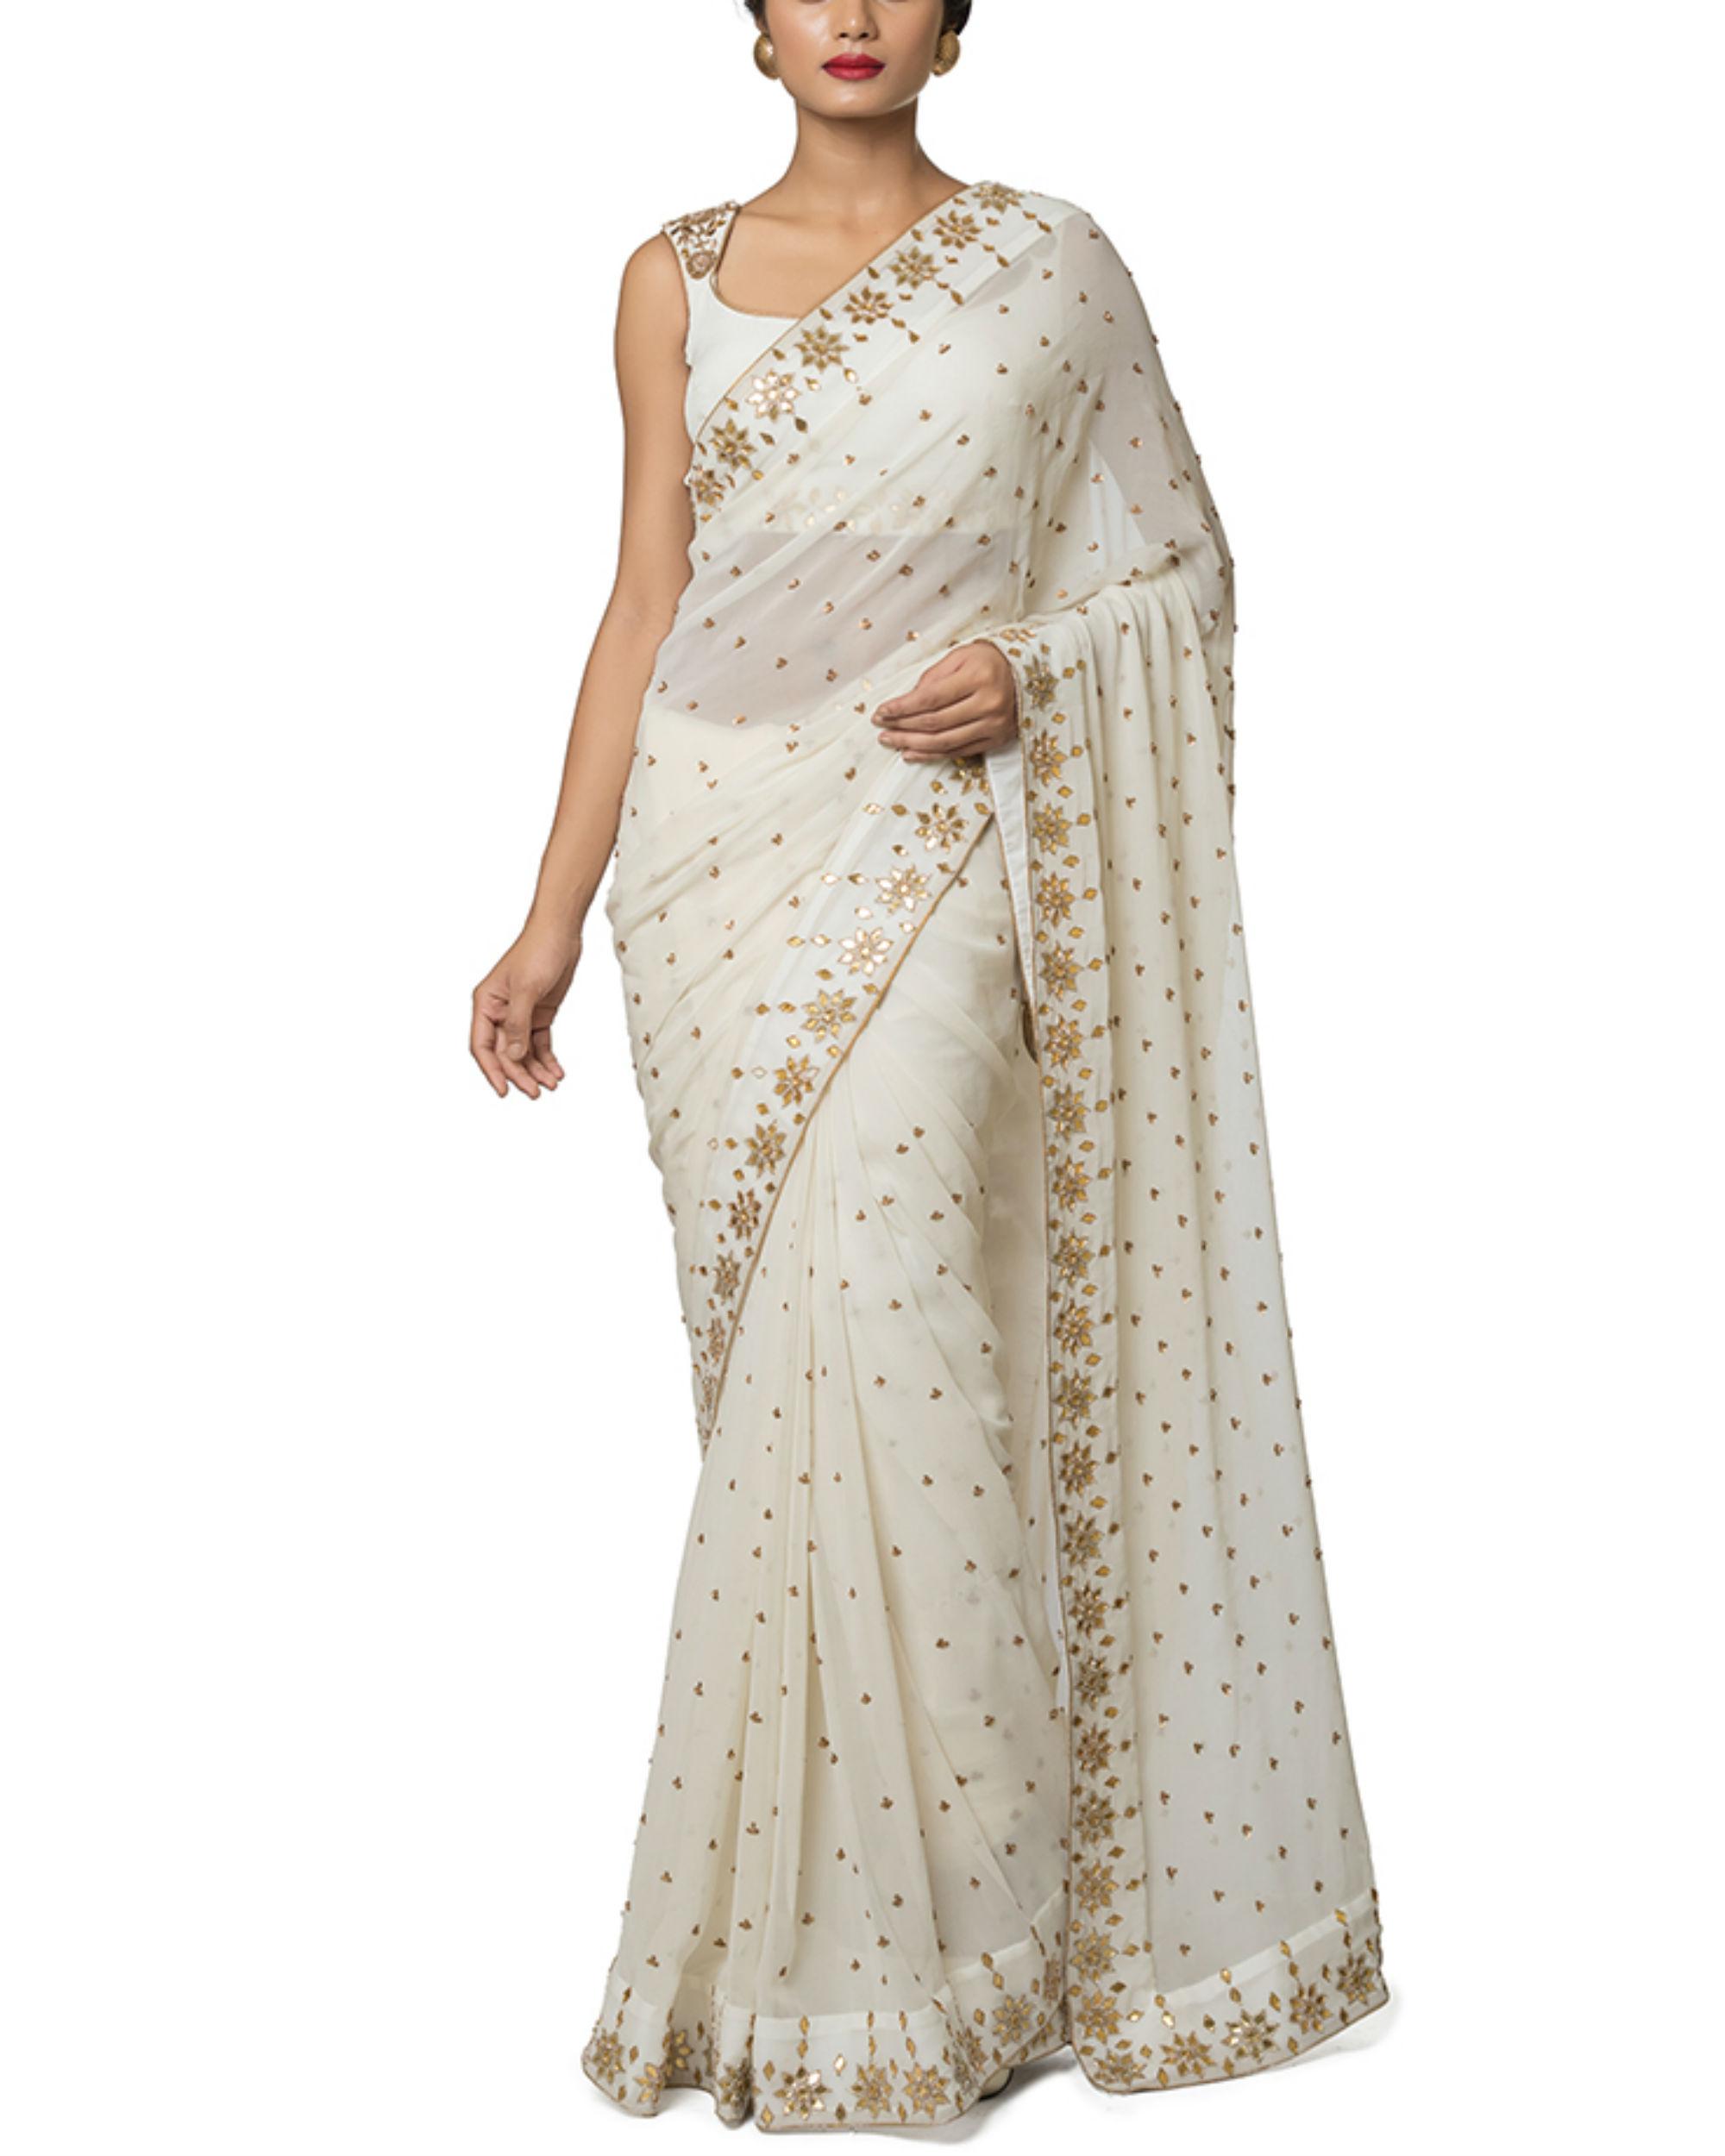 Ivory gota embroidered sari